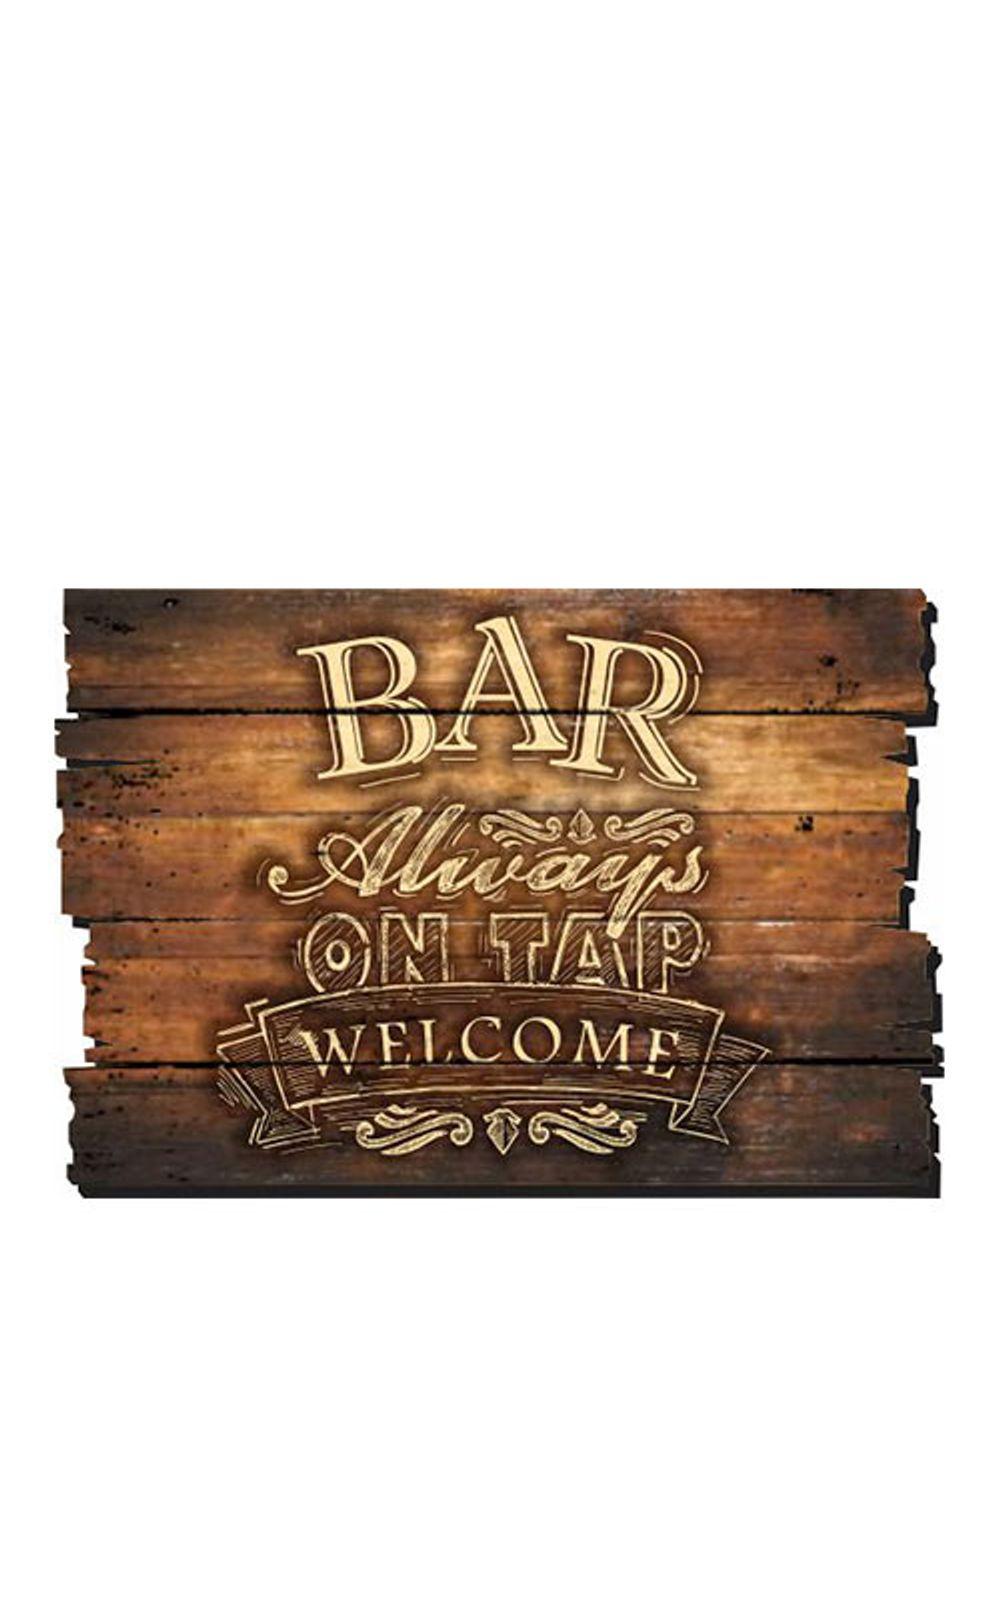 Foto 1 - Placa Decorativa em MDF Ripado Bar Always on tap Welcome